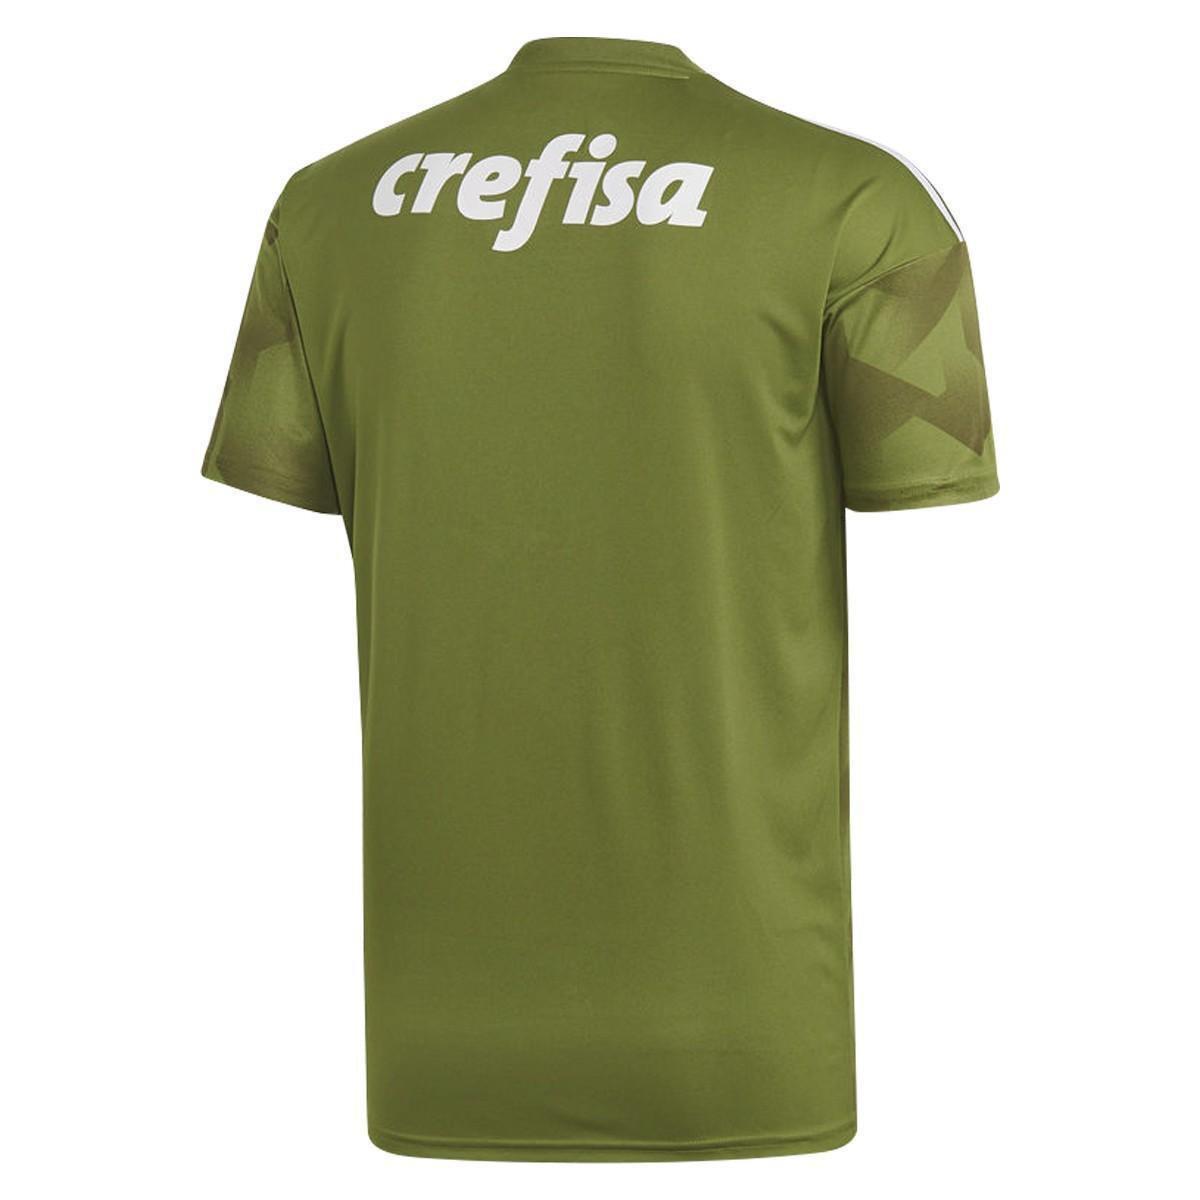 8faa6cc20c Camisa Palmeiras III 2018 s n° - Torcedor Adidas Masculina - Verde ...